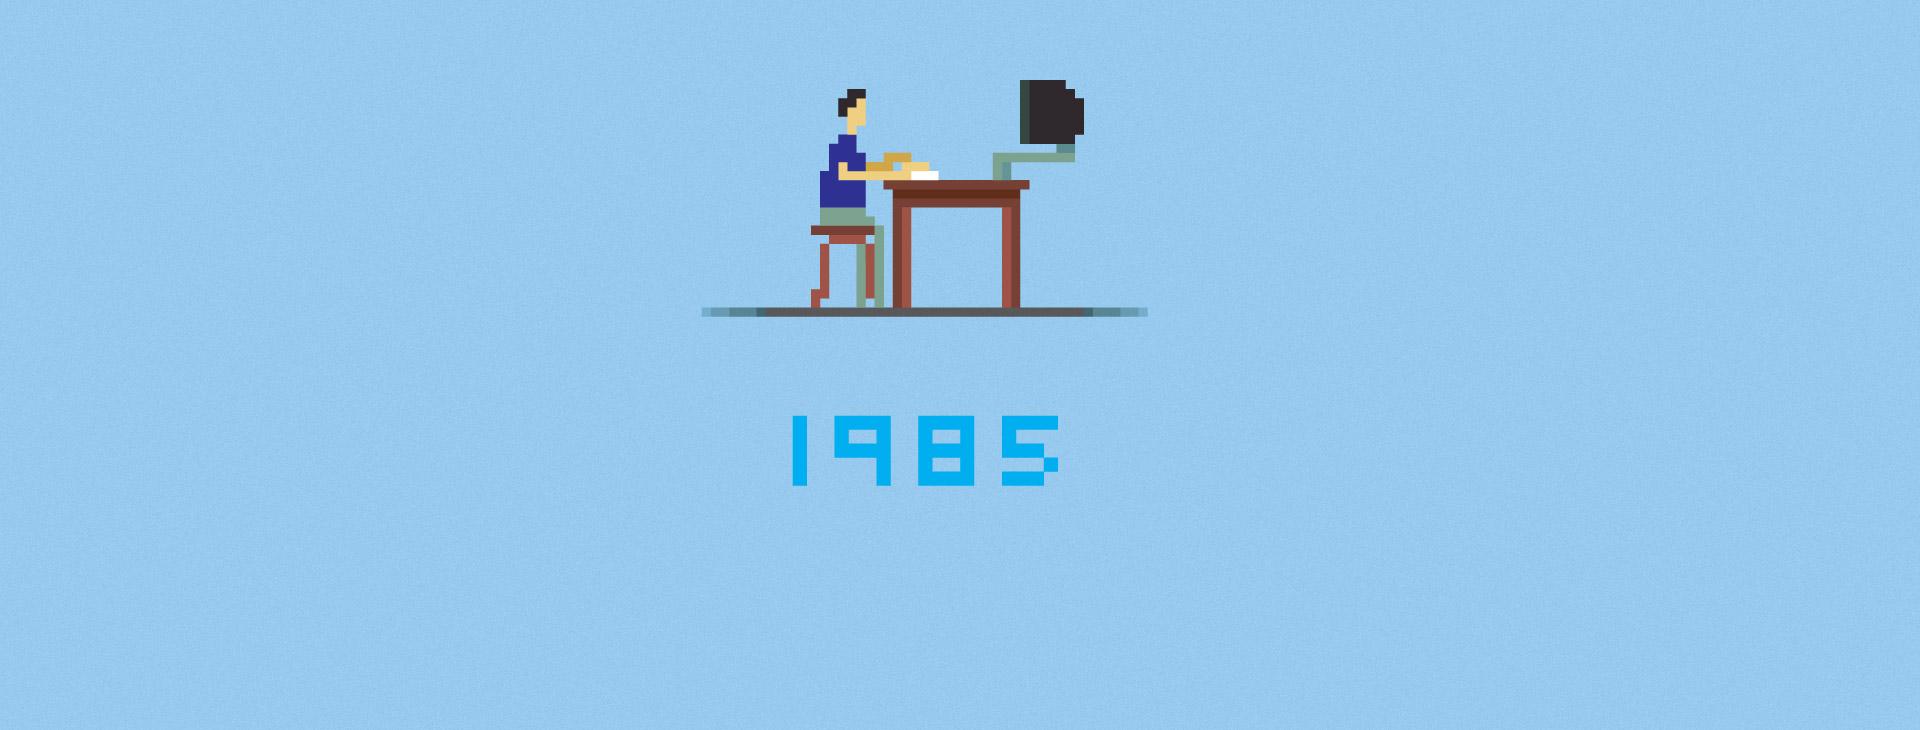 Pixel_1985_2